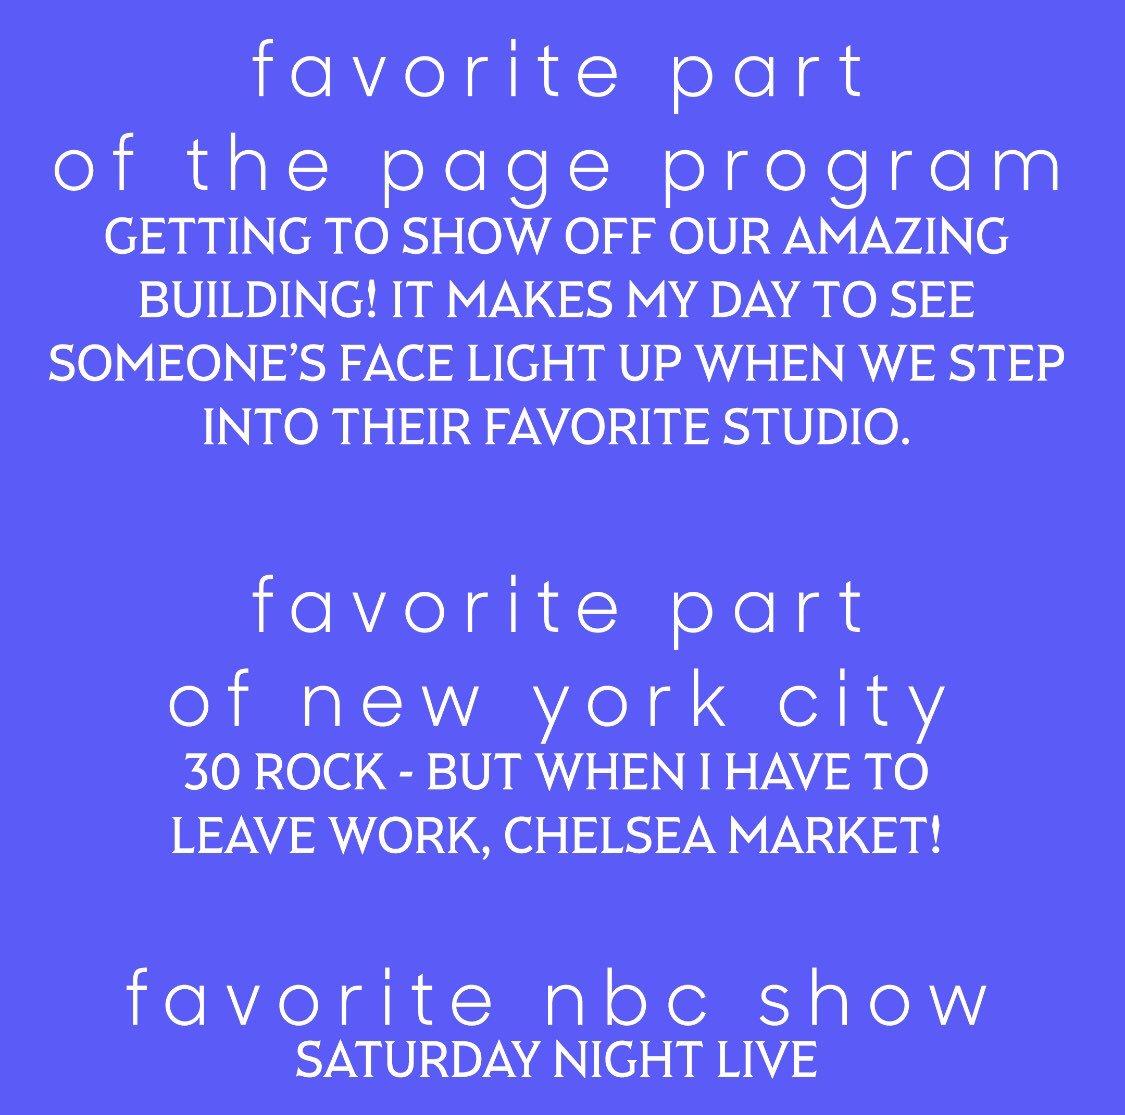 NBCU Page Program (@nbcuPageProgram) | Twitter